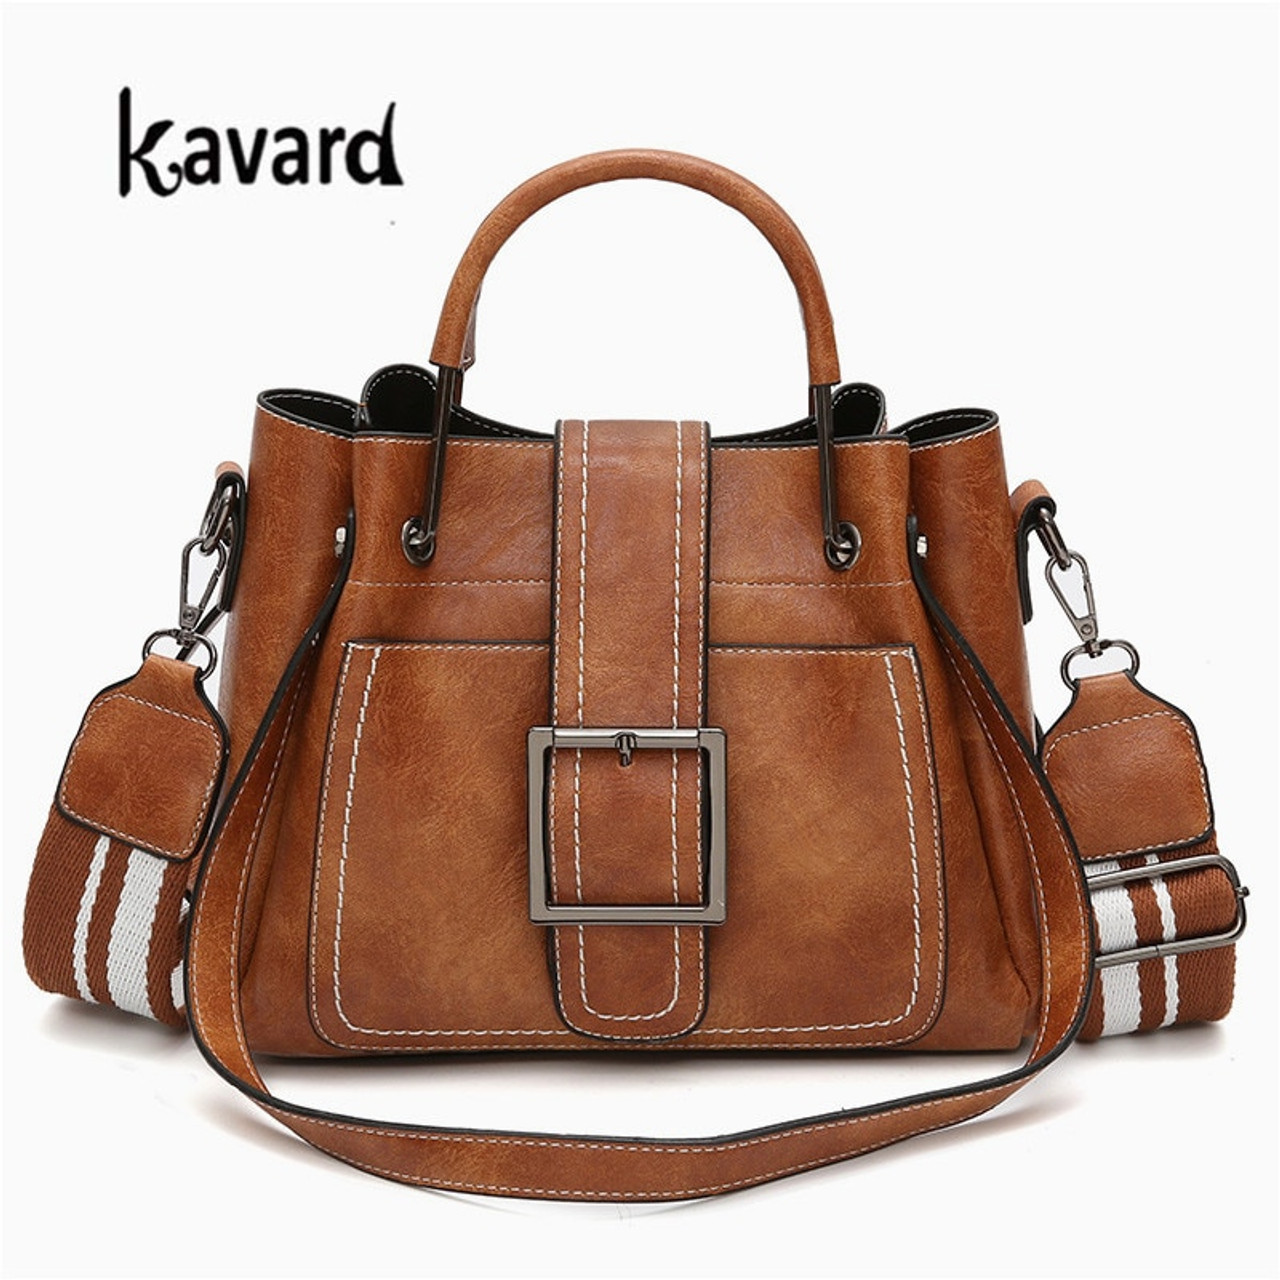 4403e334d0d Kavard Brand Women Messenger Bags Vintage Belts Shoulder Bags Sequined  Women Handbags Designer PU Leather Ladies Hand Bags Sac